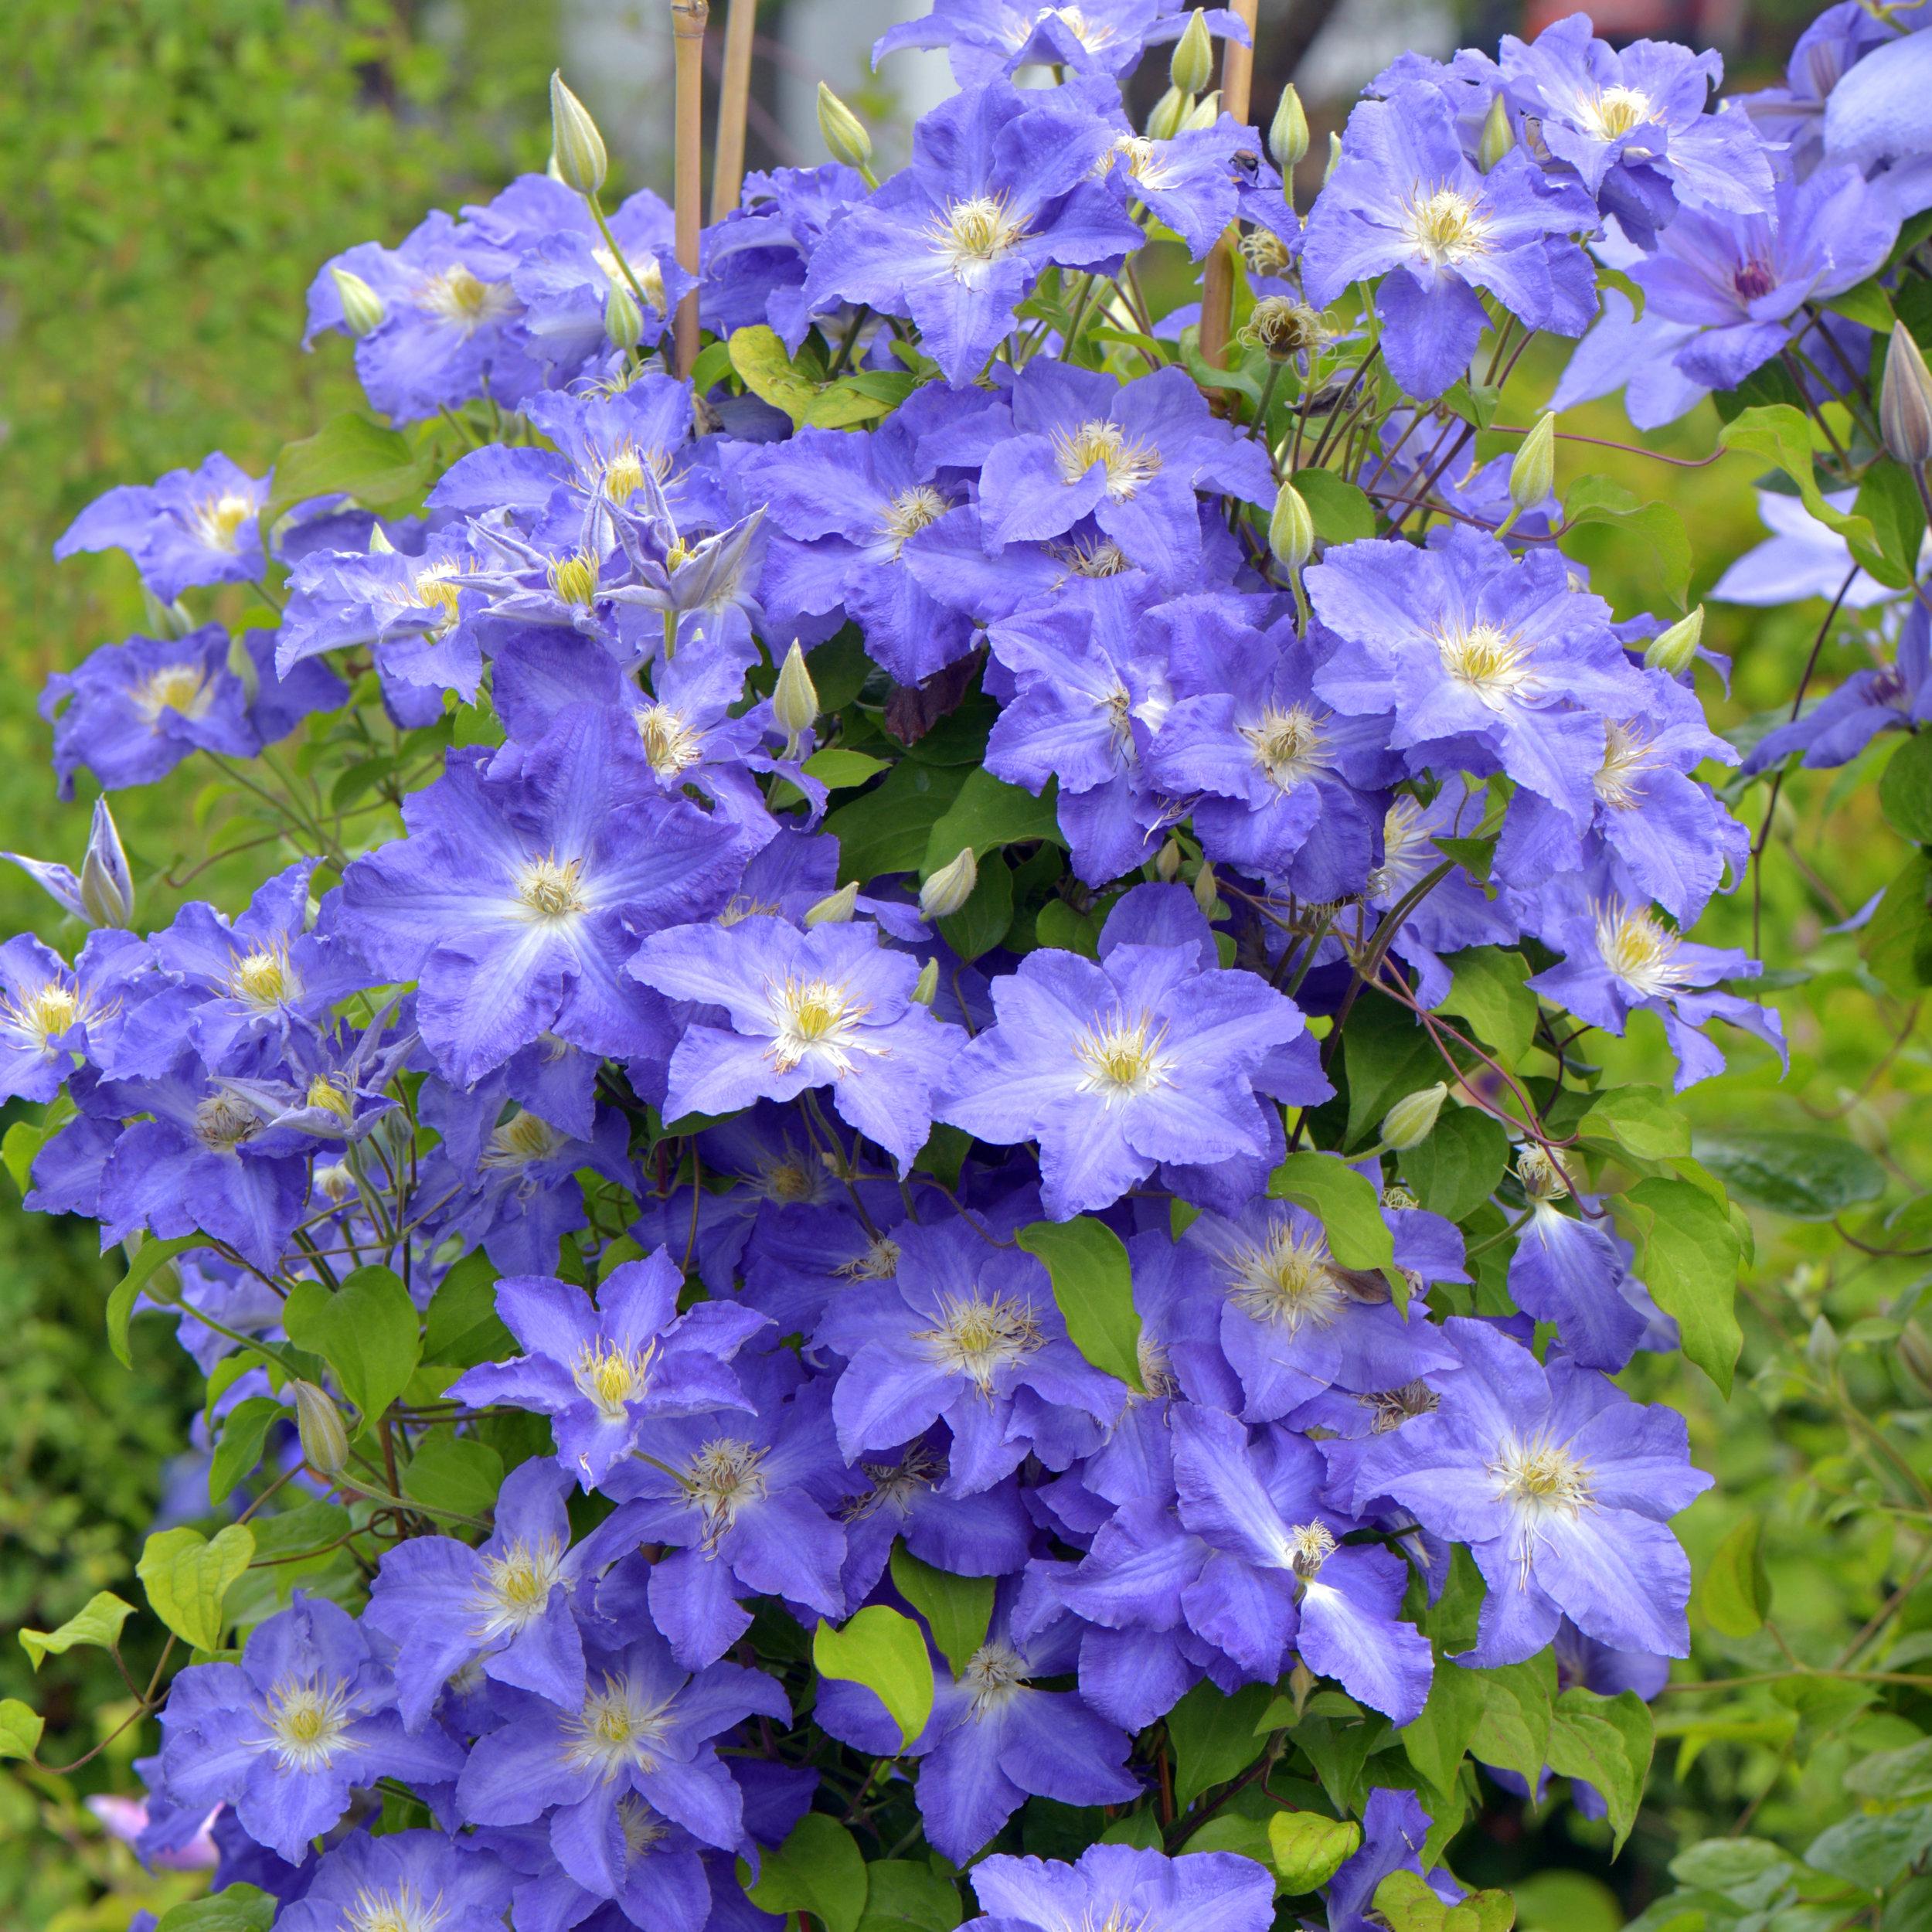 Brother_Stefan_clematis_Franczek_vine_easiest_garden.jpg